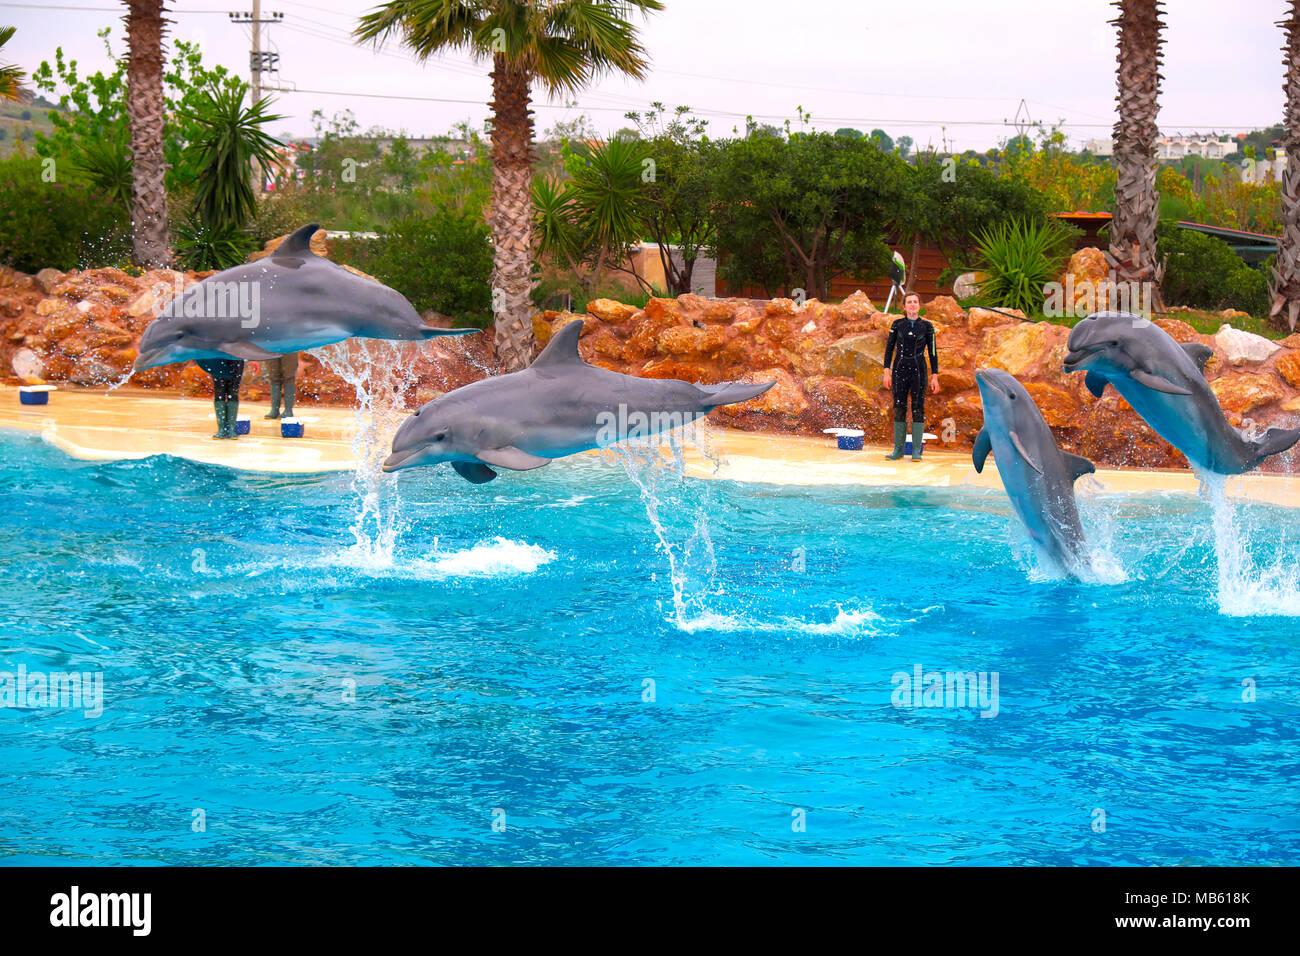 Athens, Attica / Greece - 2018/03/31: Common bottlenose dolphins, known as Atlantic bottlenose dolphin or Bottle-Nosed Dolphin, during a sea life show - Stock Image